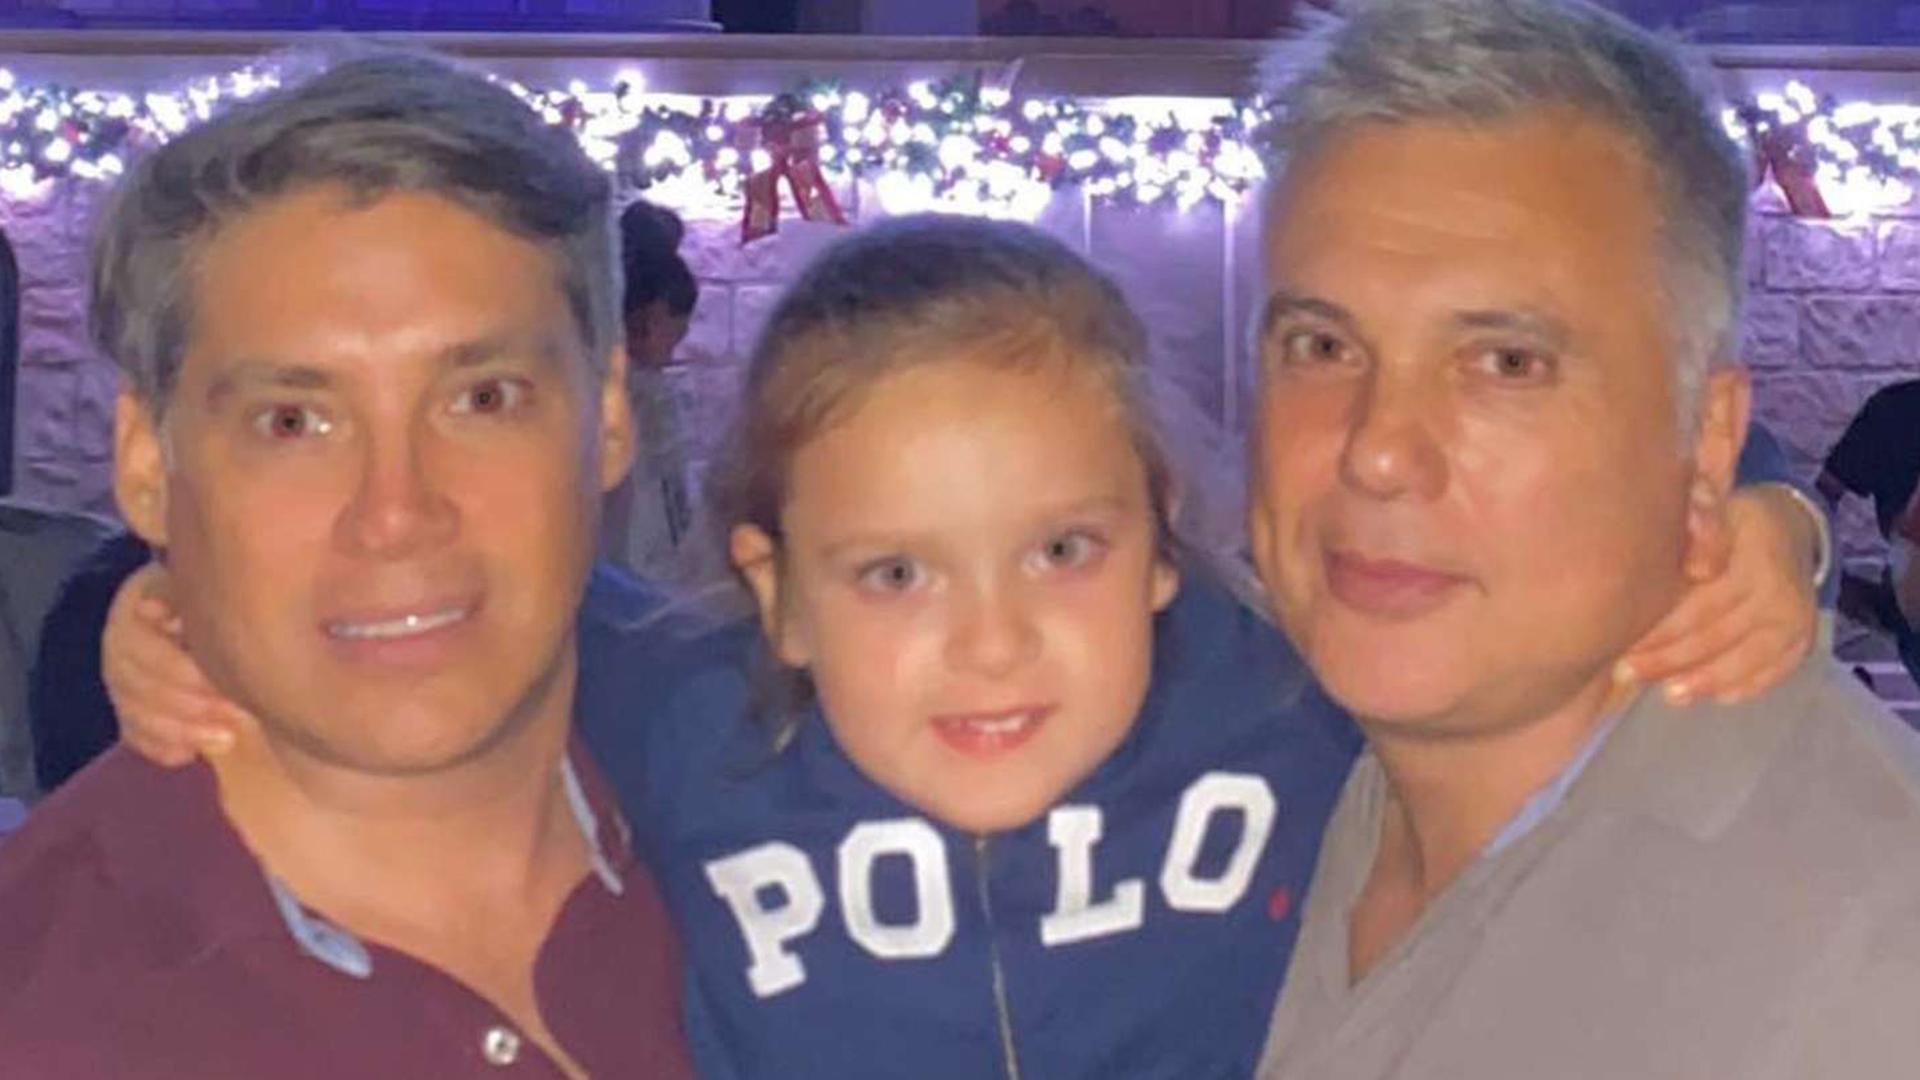 Derrumbe en Miami Andrés Galfrascoli y Fabián Nuñez